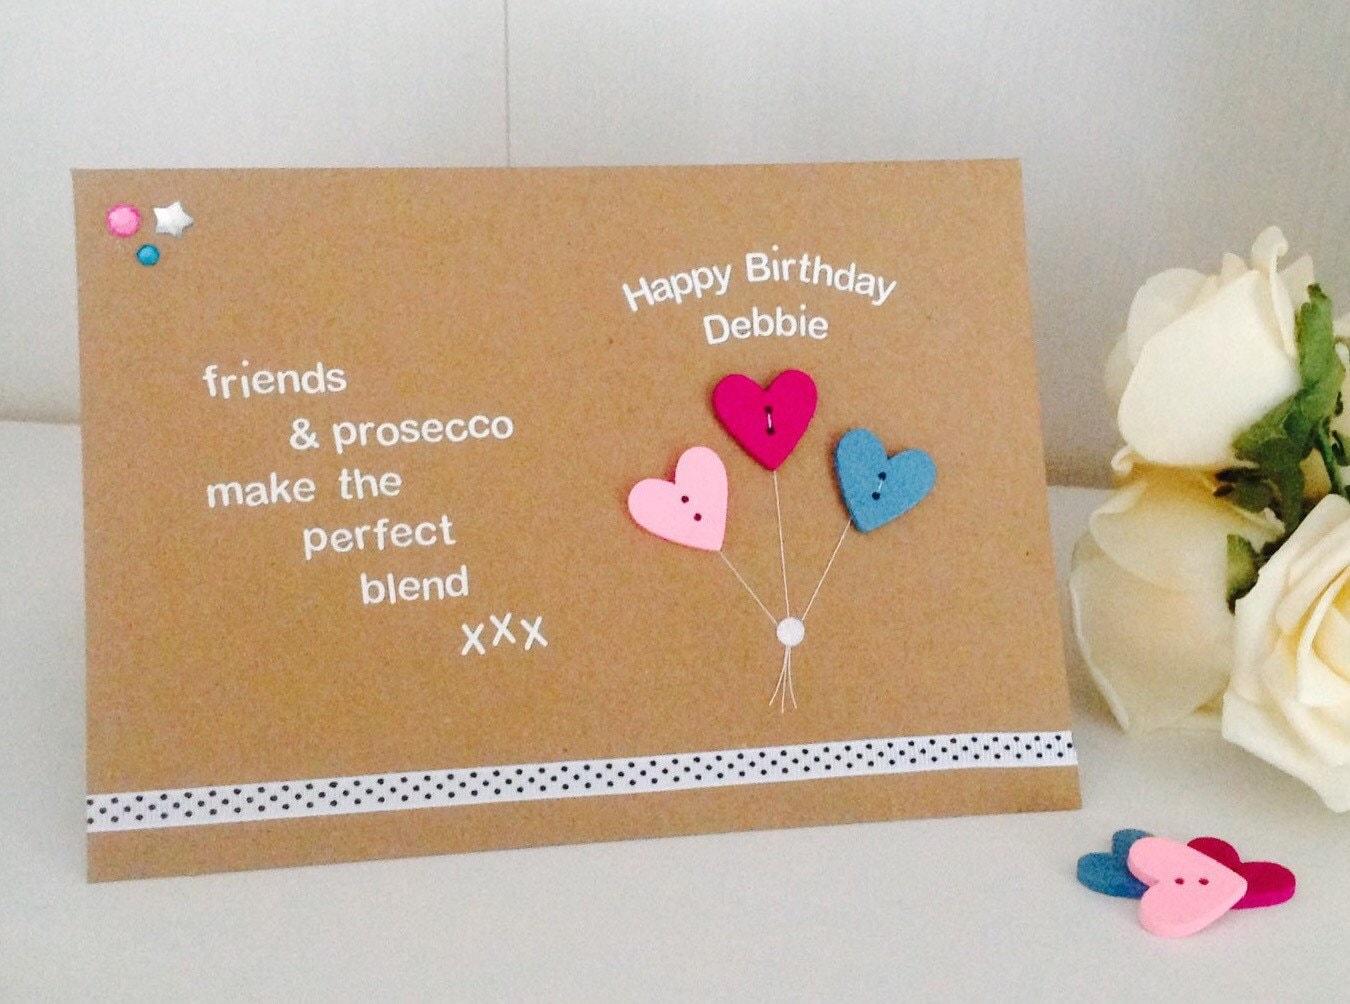 Friends Prosecco Quote Handmade Happy Birthday Card